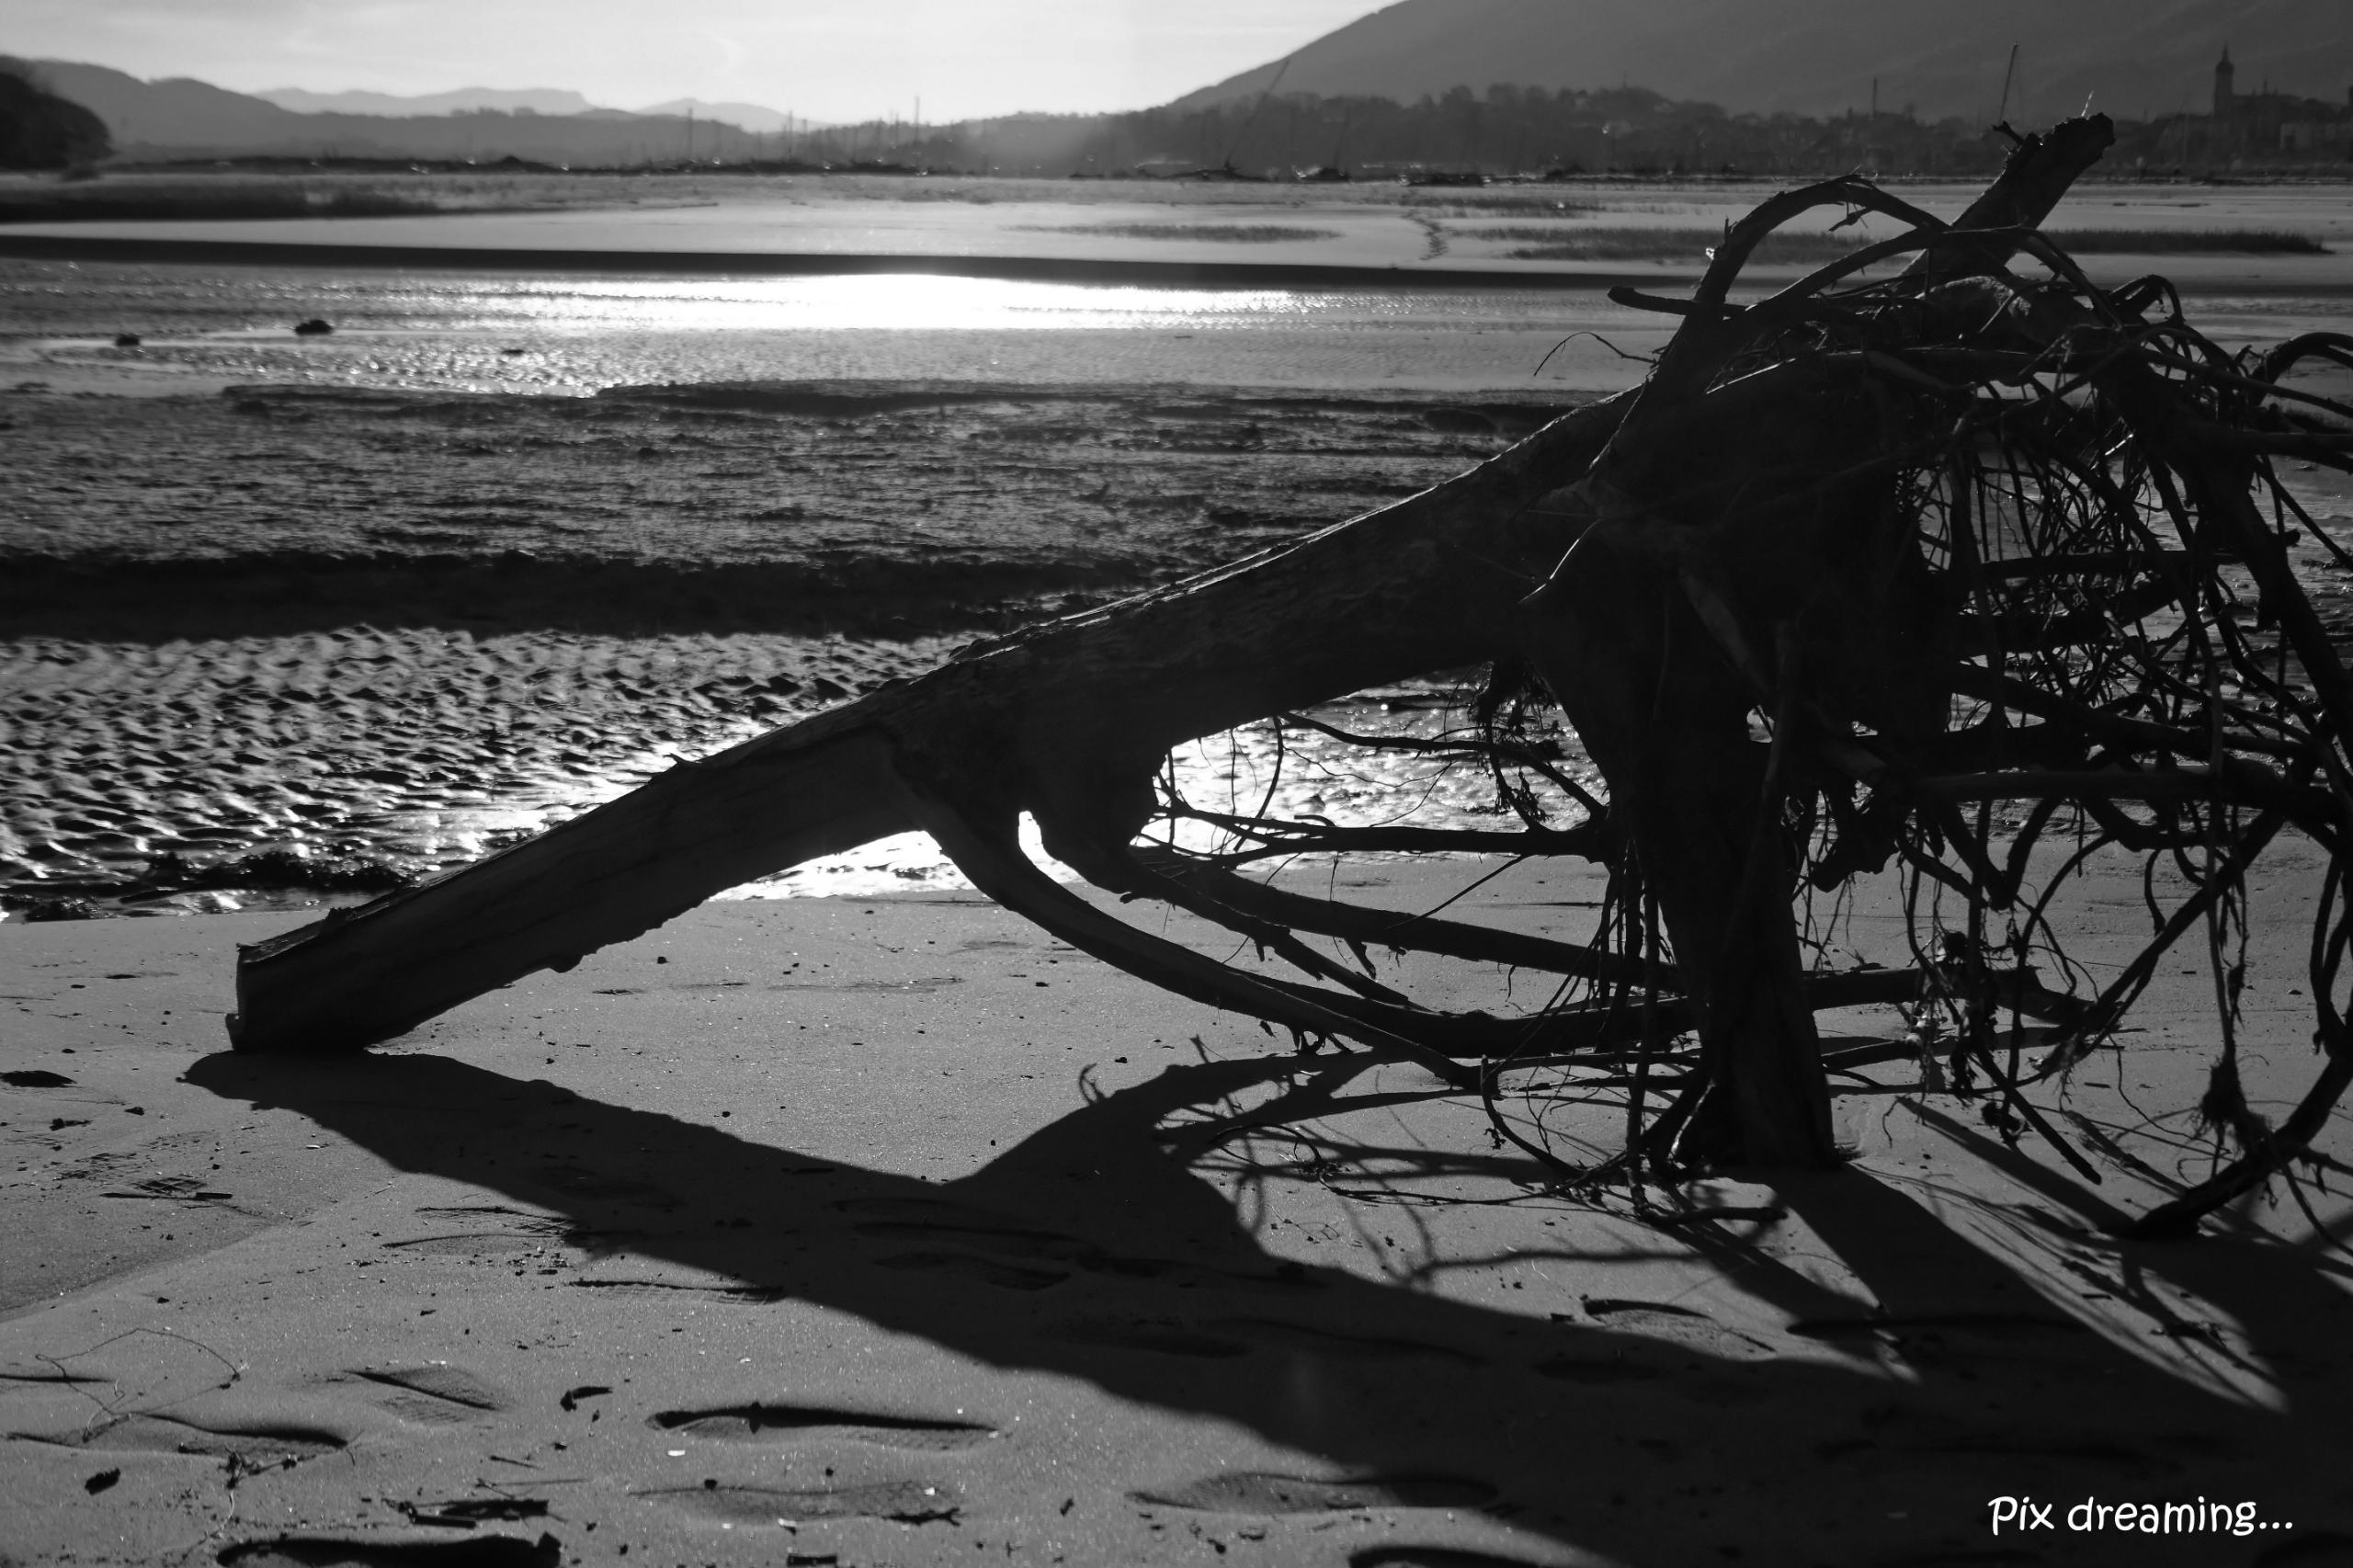 Lonely branch - photography, blackandwhite - pixdreaming   ello